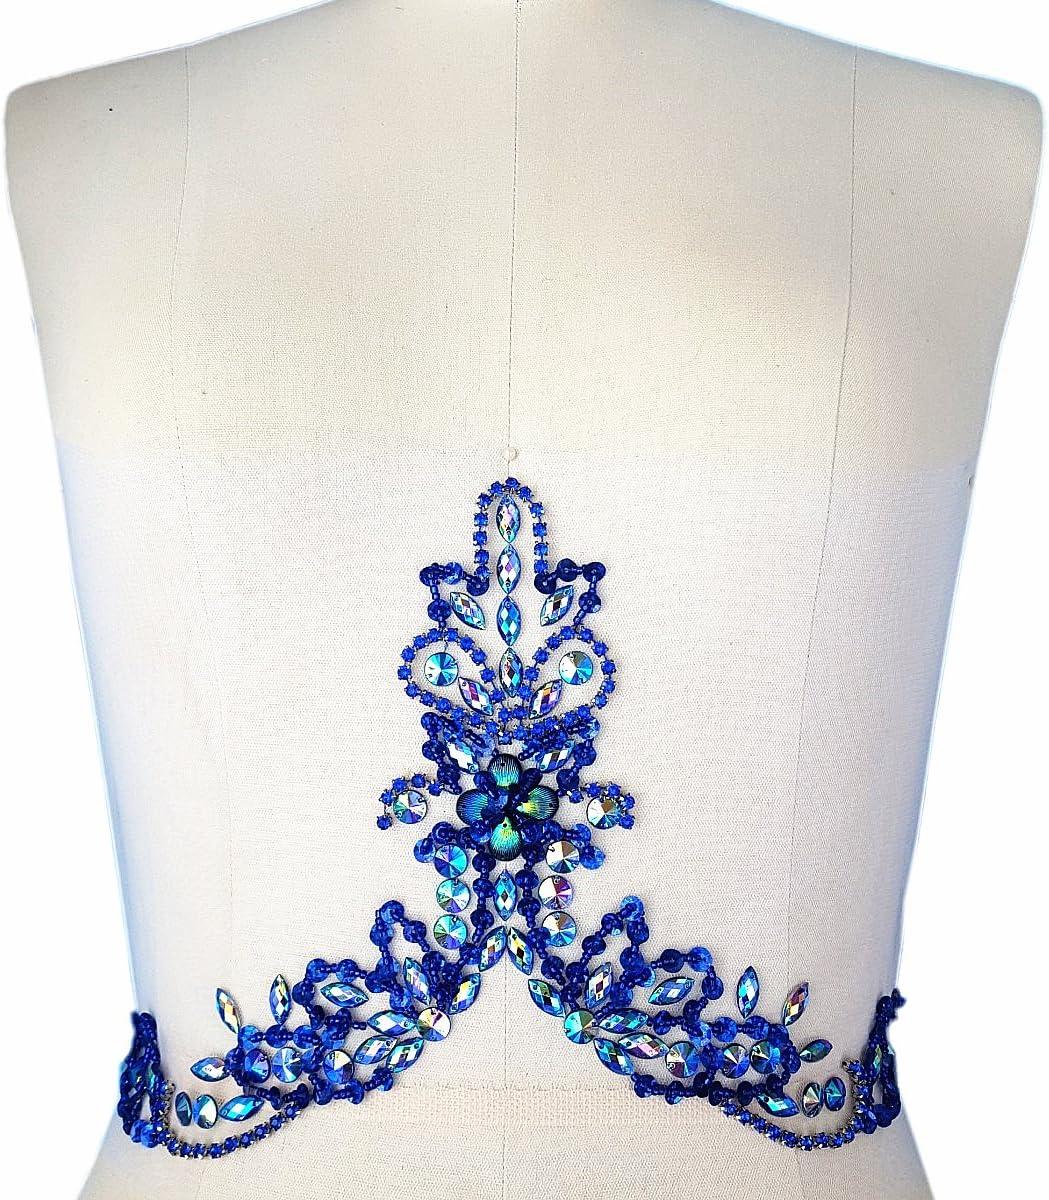 AB Handmade Beaded V-Neck Sequin Sew On Neckline Rhinestone Crystal Trim Bridal Applique Design Patch Sewing for Wedding Dresses DIY Belt Decoration